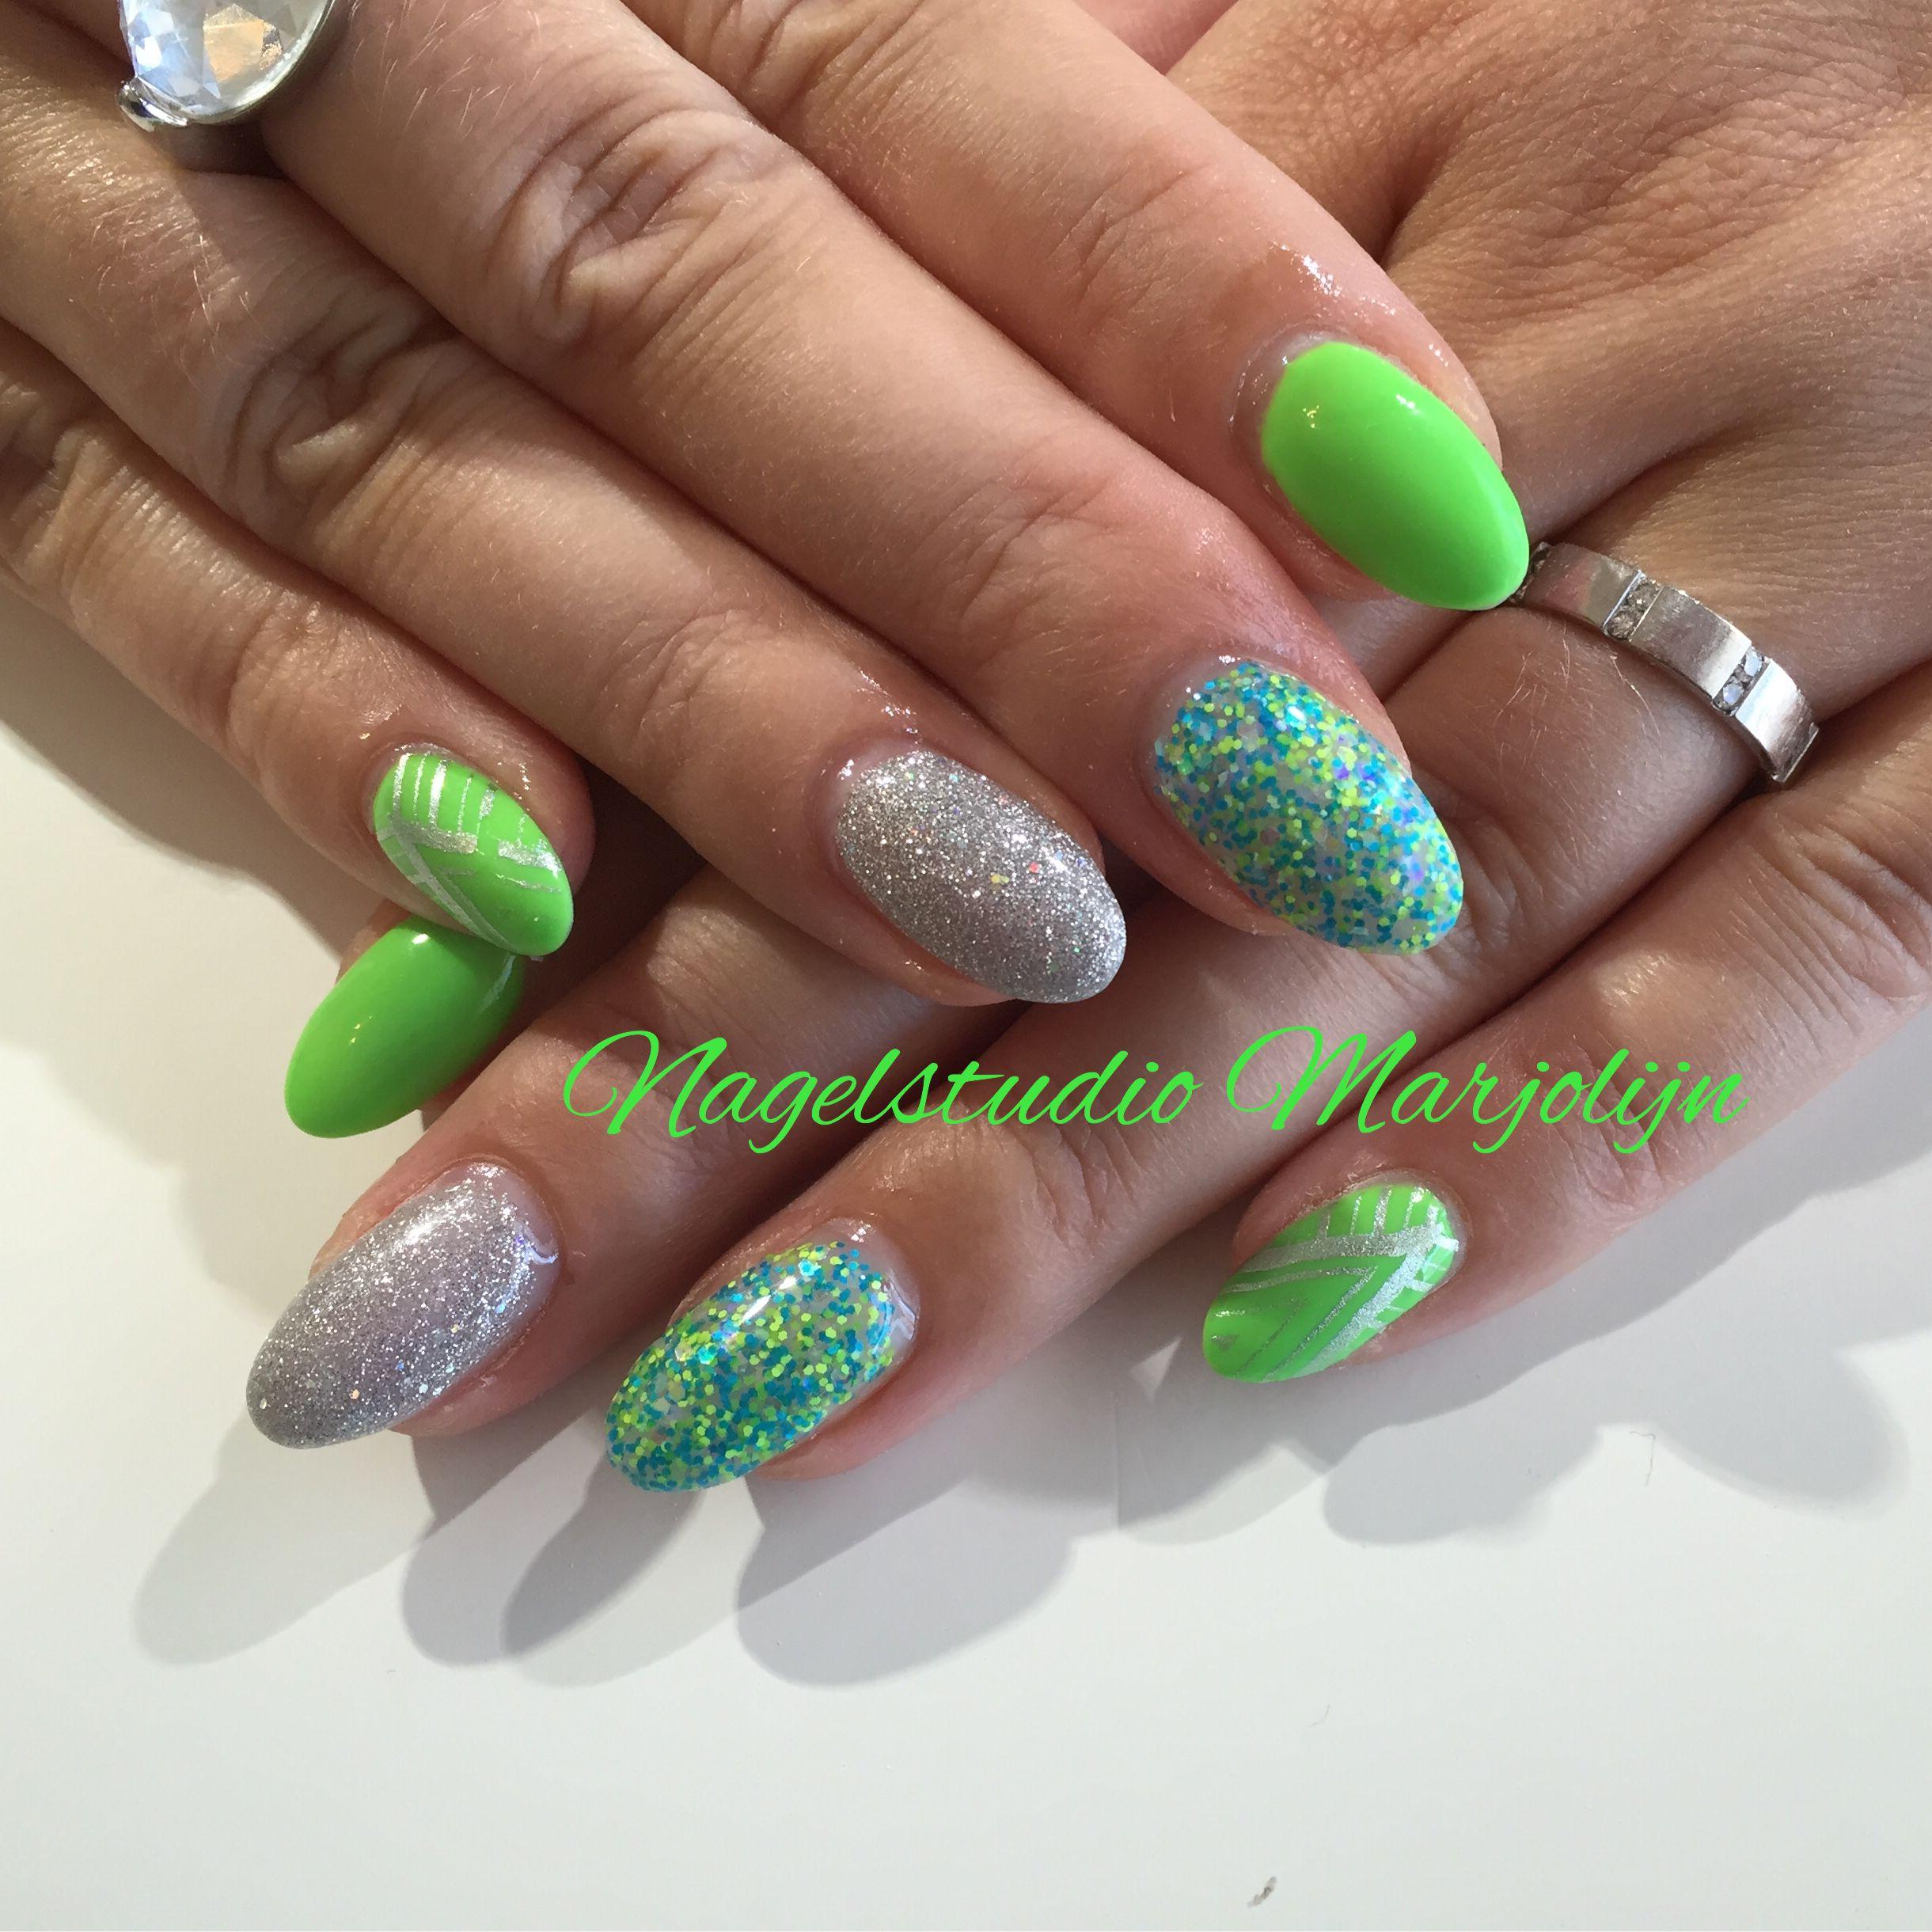 Full color nail art - Grasshopper Nails Nailart Fullcolor Gel Cnd Cndshellac Icevapor